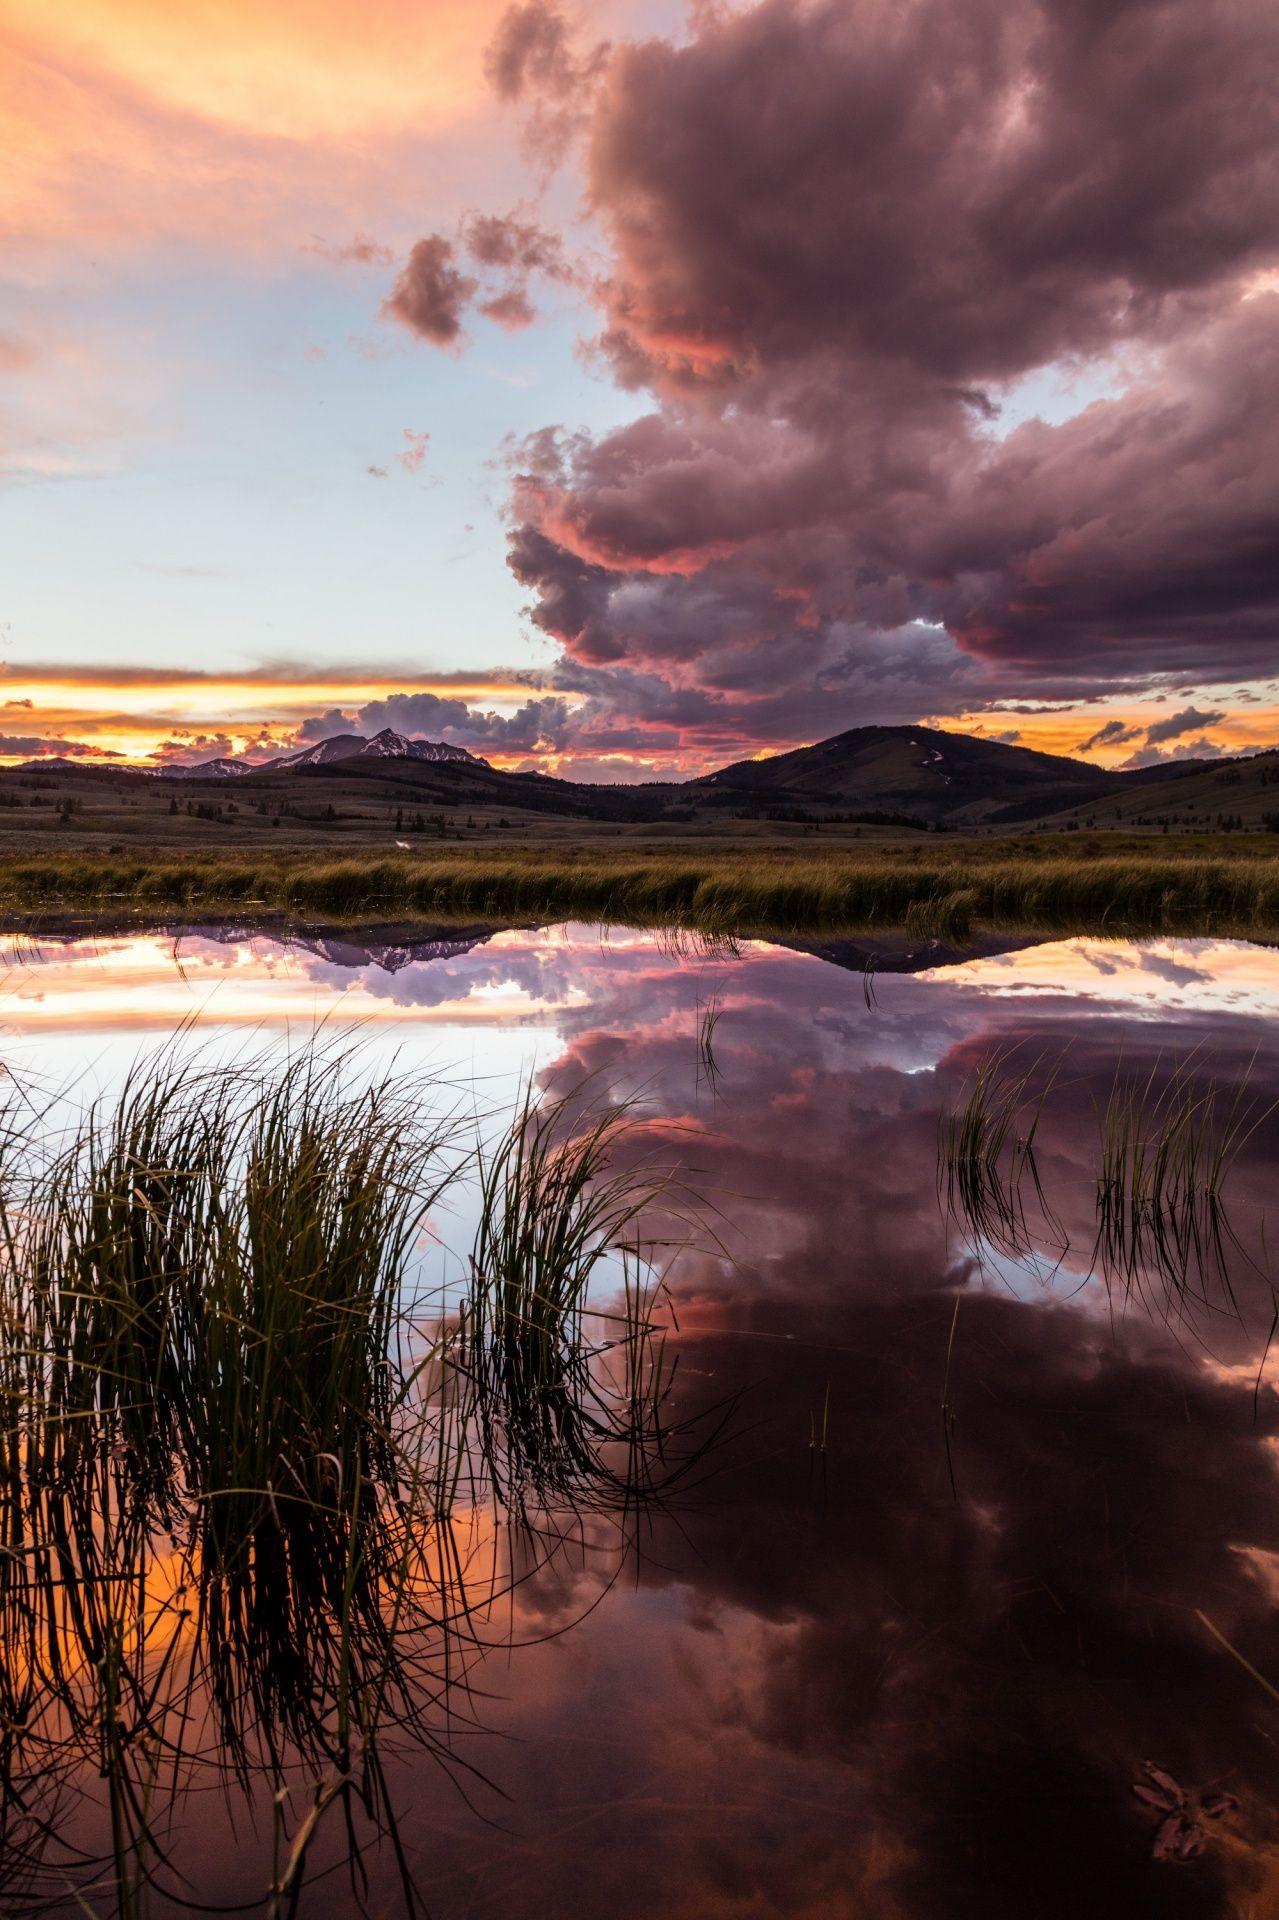 Yellowstone Sunset Free Stock Photo Android wallpaper